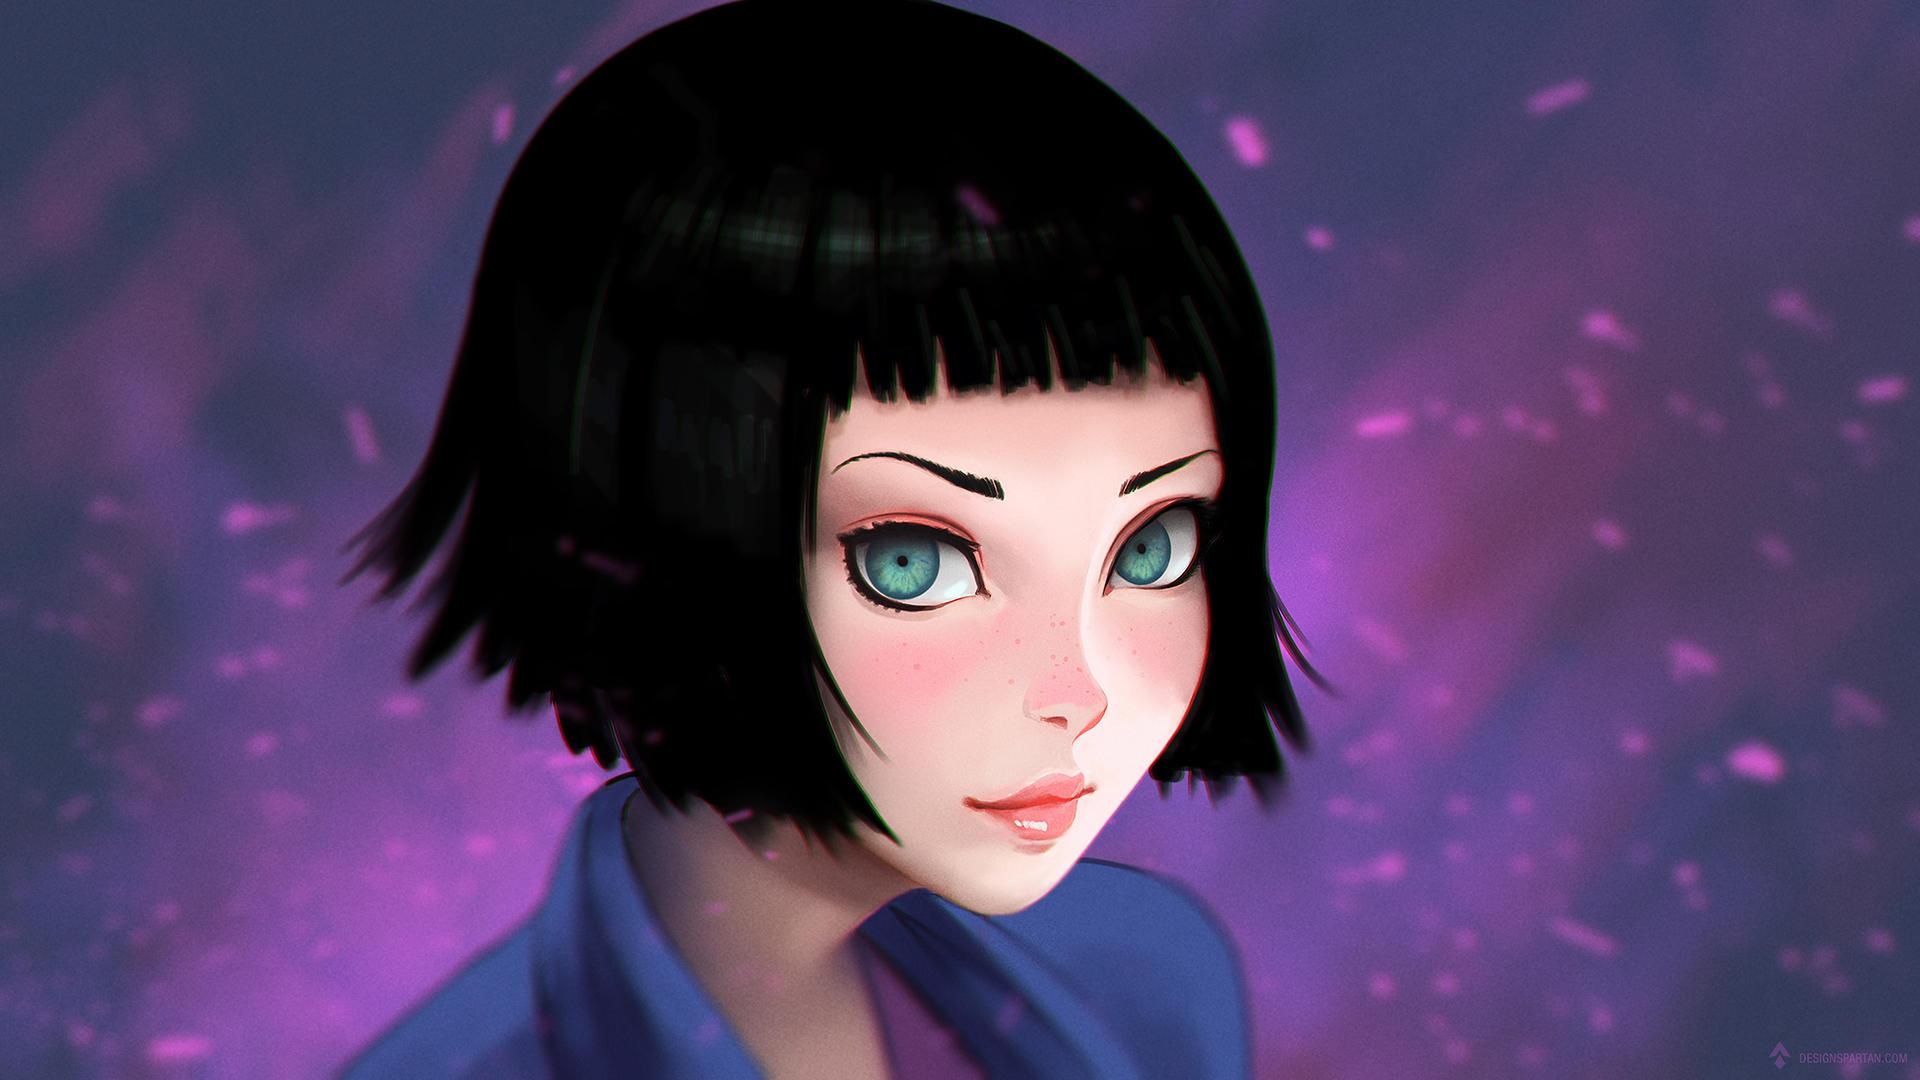 Semi-manga portrait tutorial [video] by DesignSpartan